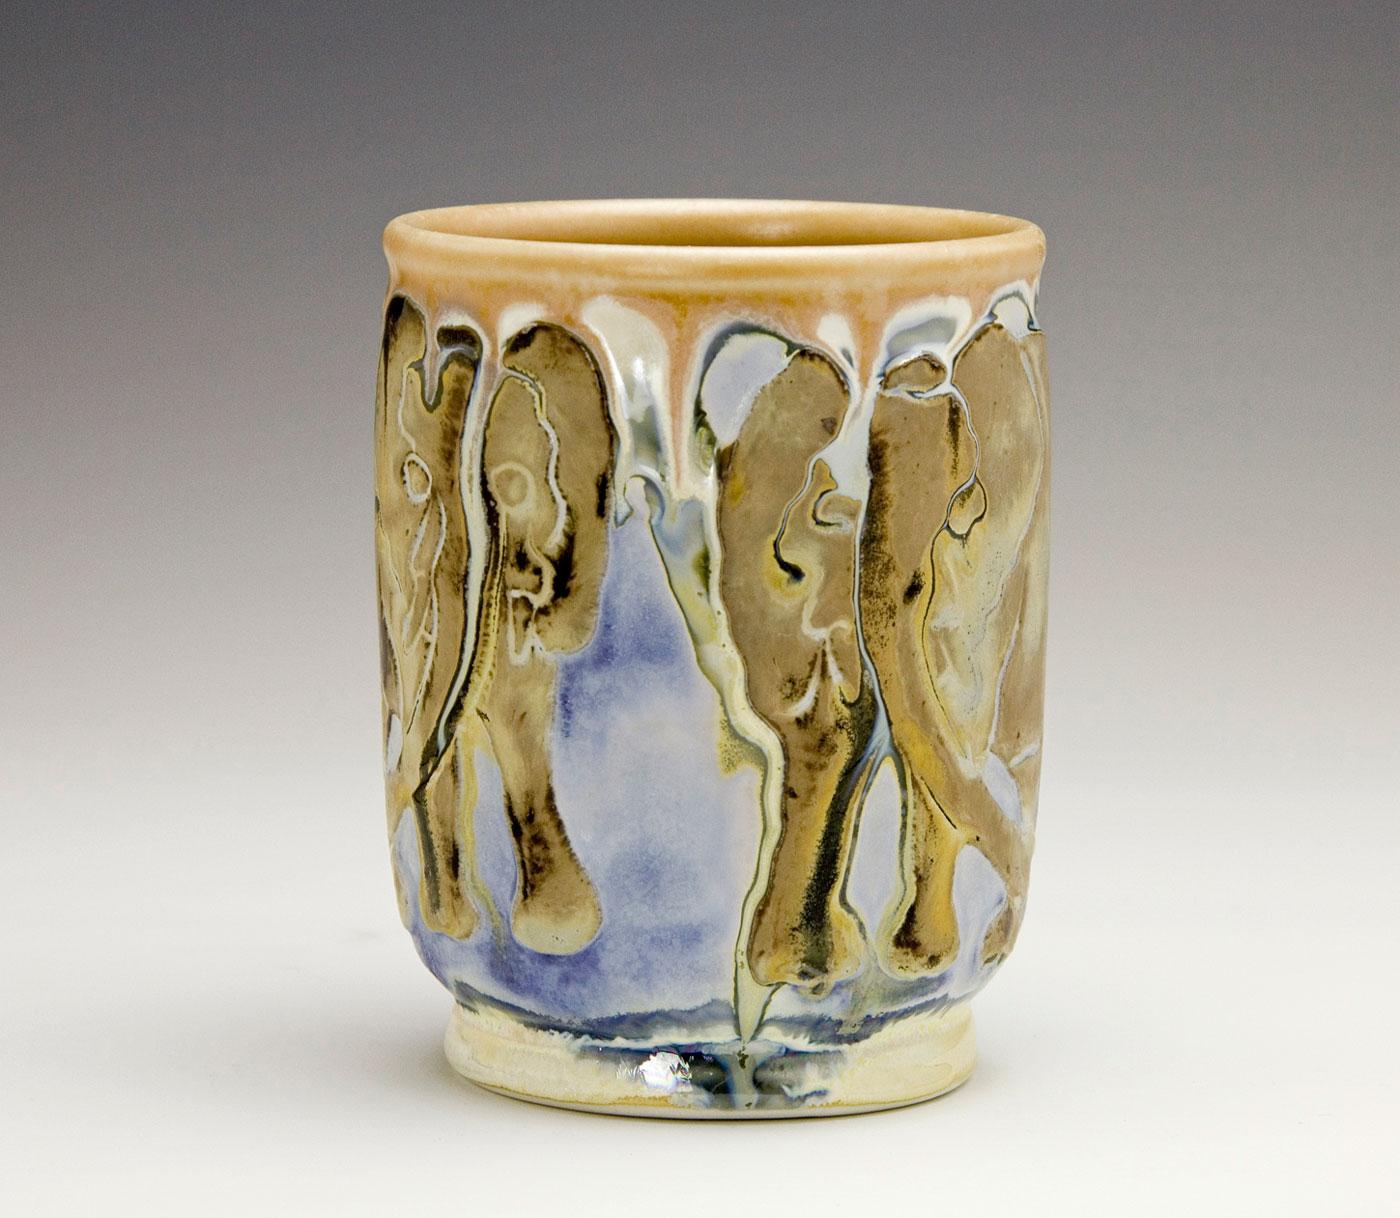 Two-Elephants-glaze-drawing-cup-Samantha-Henneke-Seagrove-Pottery.jpg